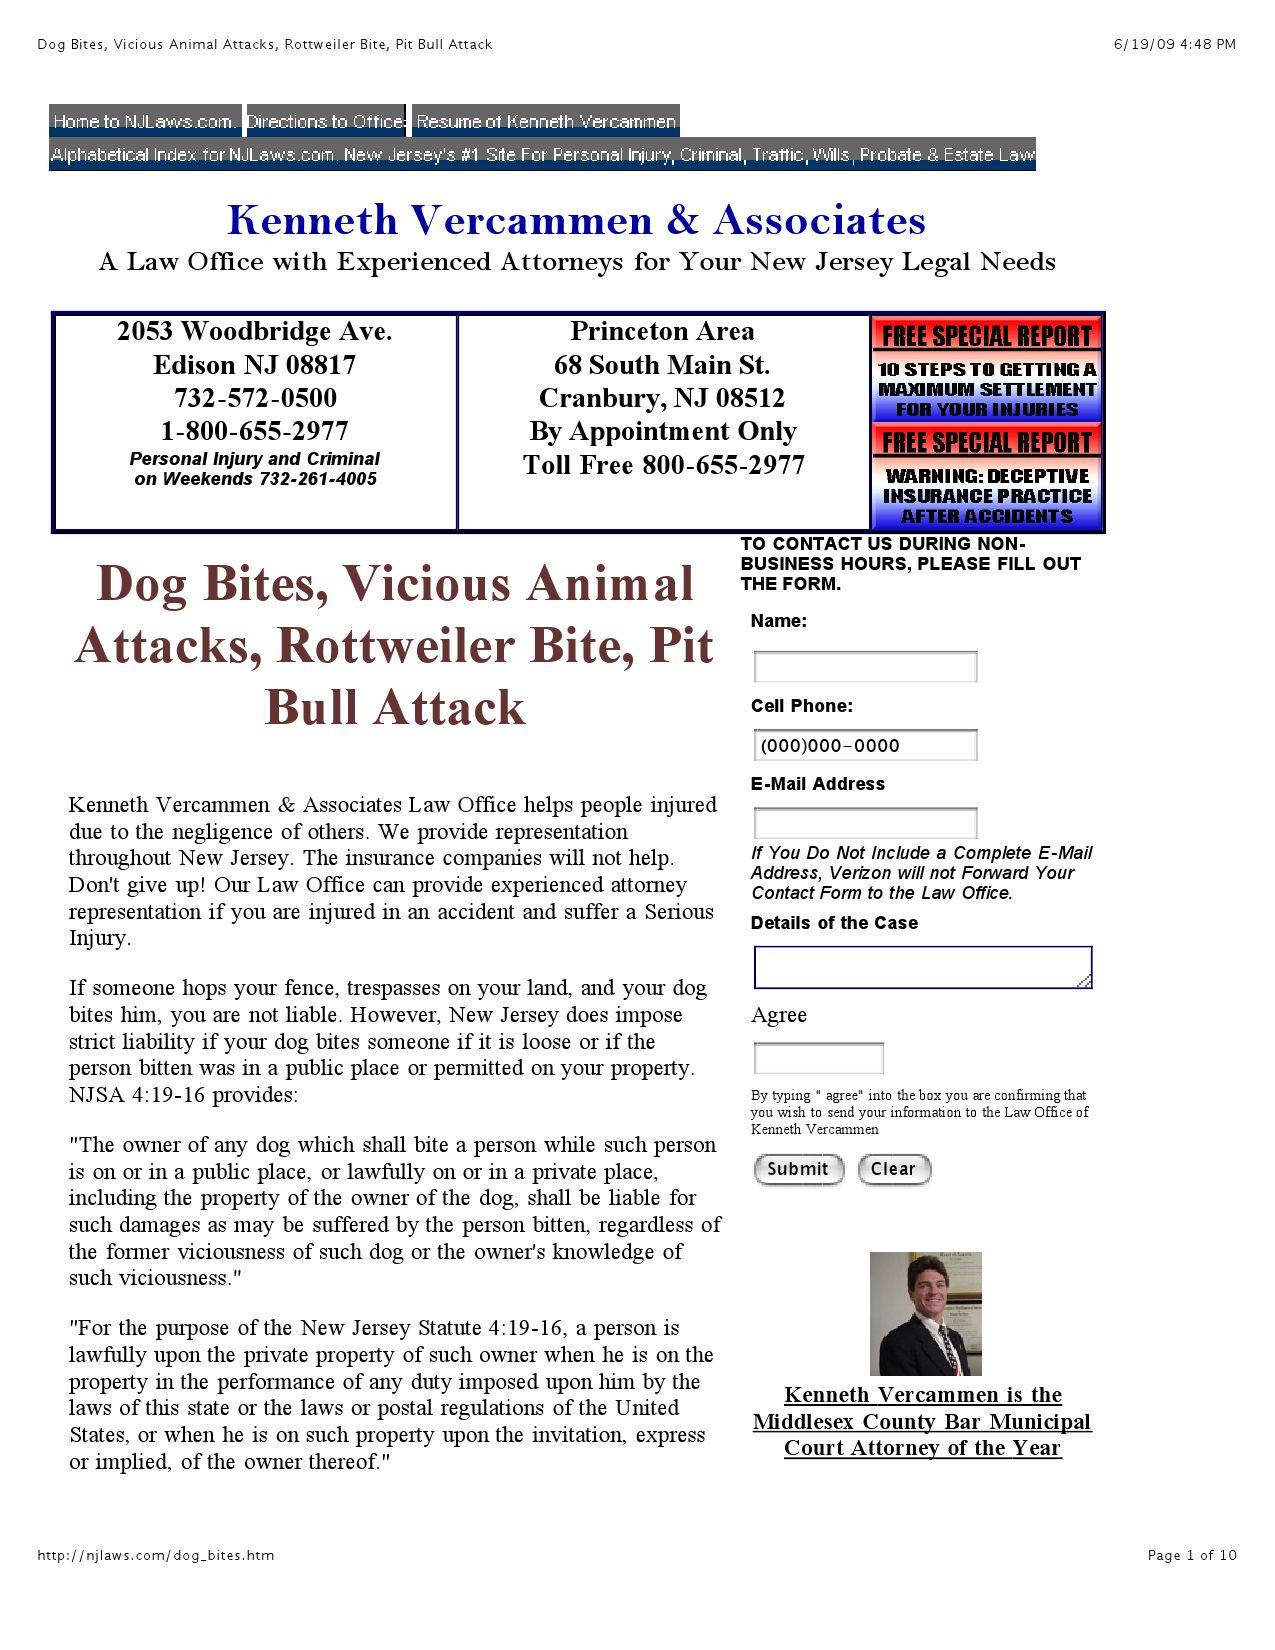 Dog Bites Vicious Animal Attacks Rottweiler Bite Pit